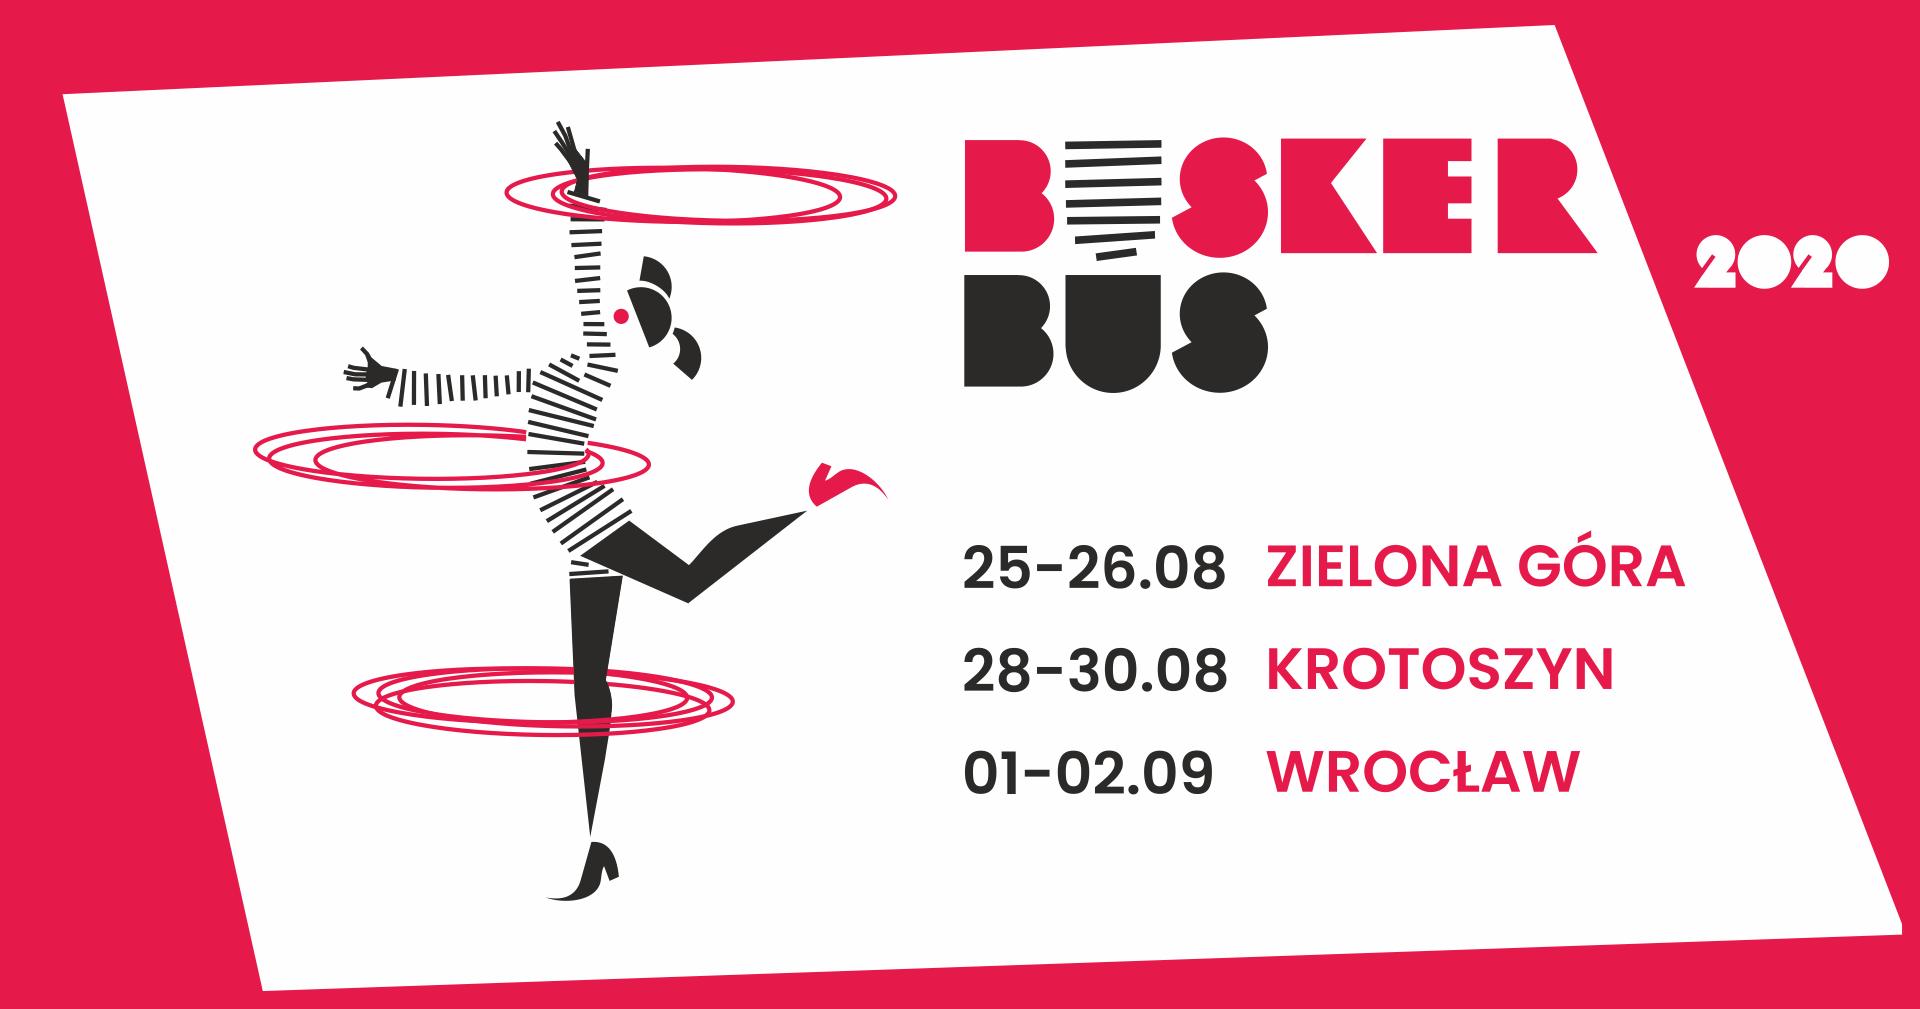 BuskerBus 2020 grafika promocyjna